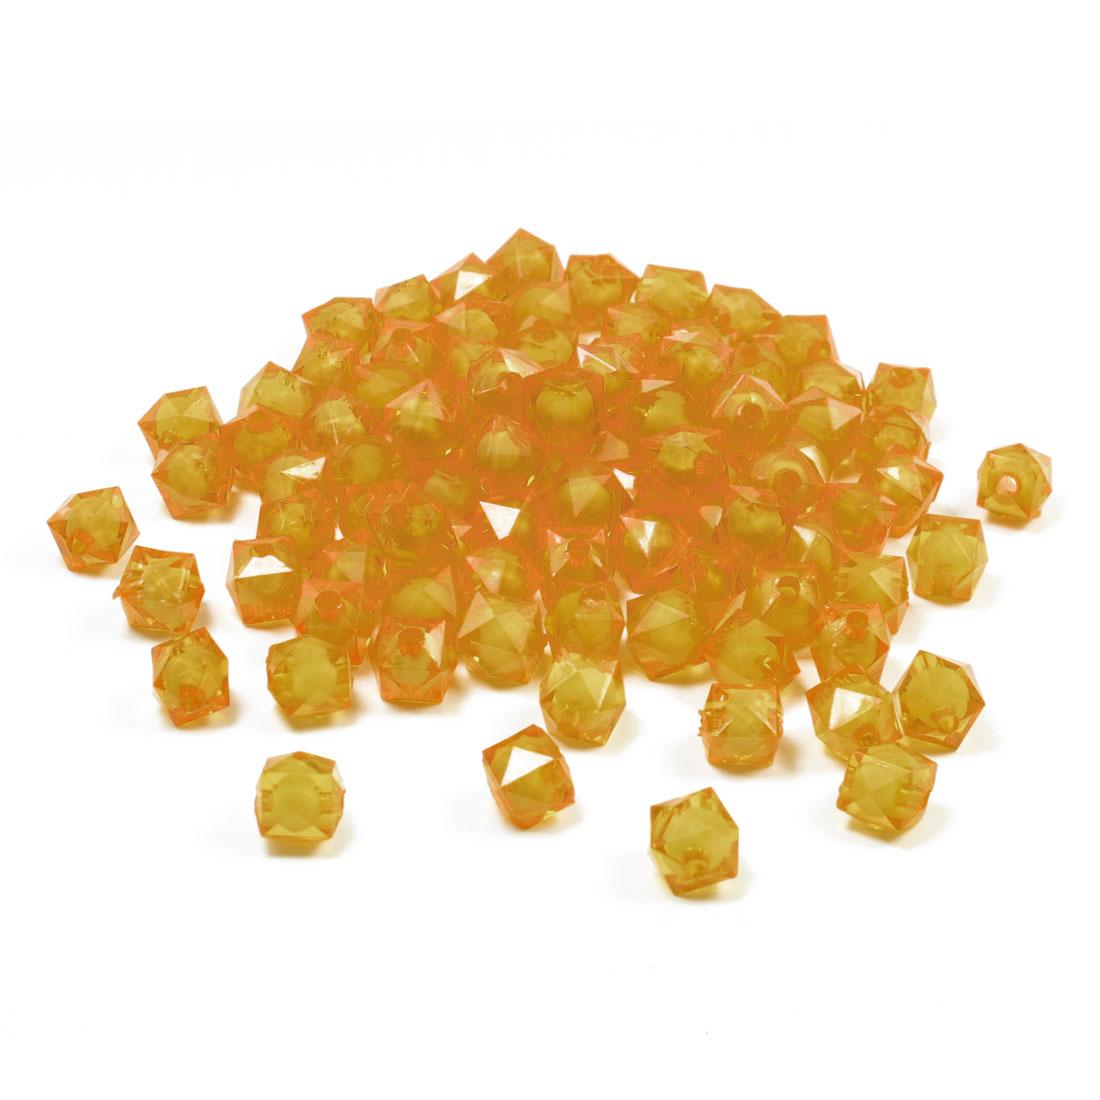 192 Pcs Orange Plastic Cross-stitch Bracelet Square Shape Faceted Beads